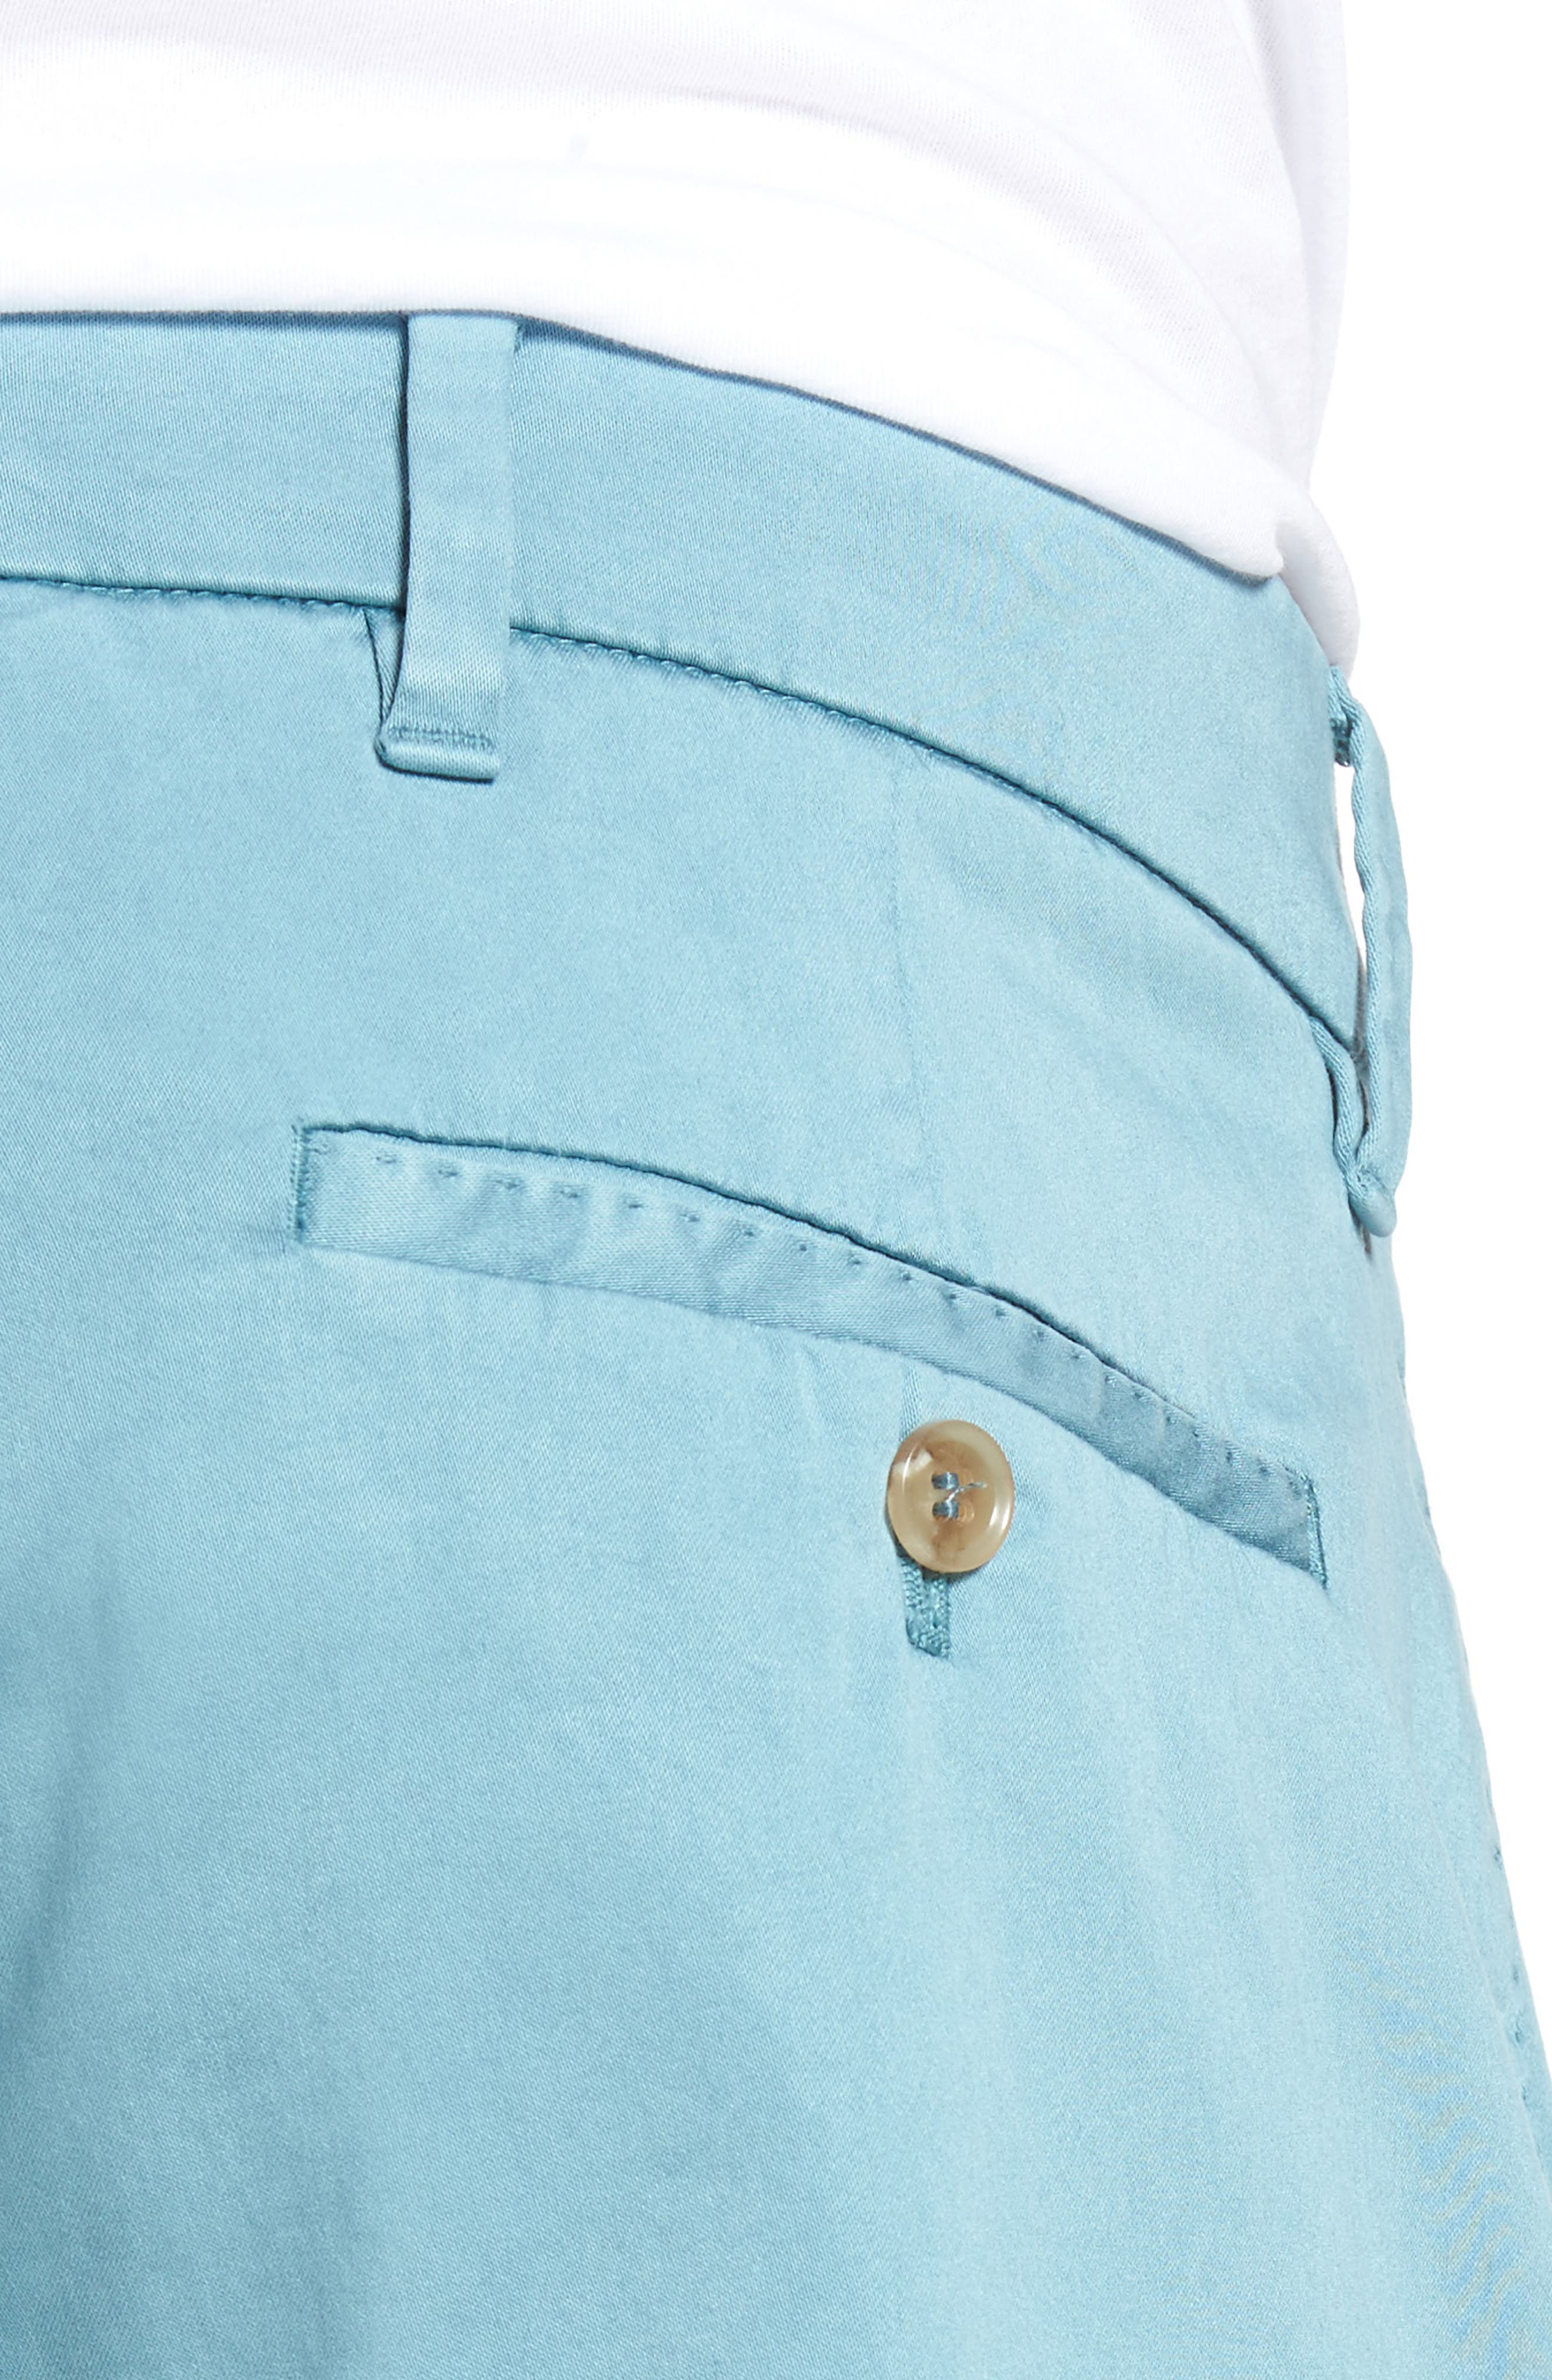 Catalpa Shorts,                             Alternate thumbnail 4, color,                             Teal